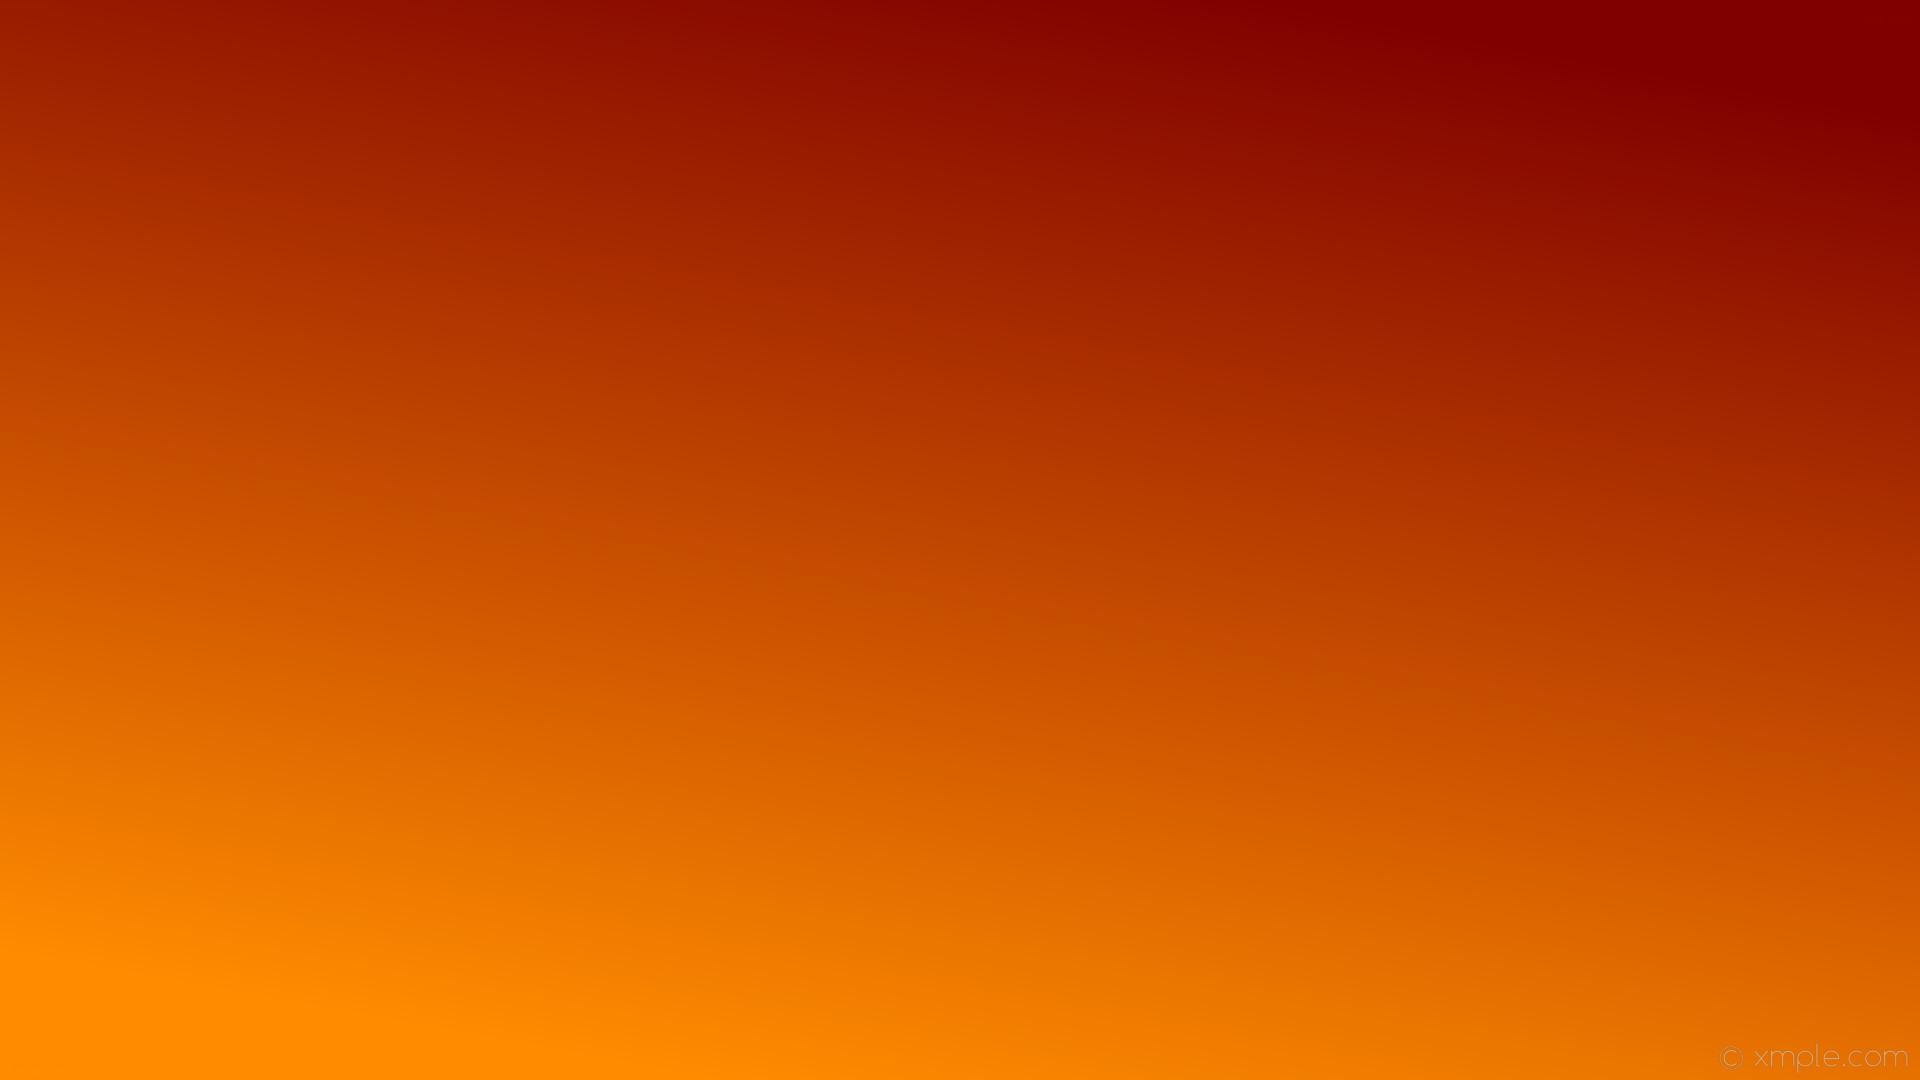 wallpaper brown orange gradient linear maroon dark orange #800000 #ff8c00  60°